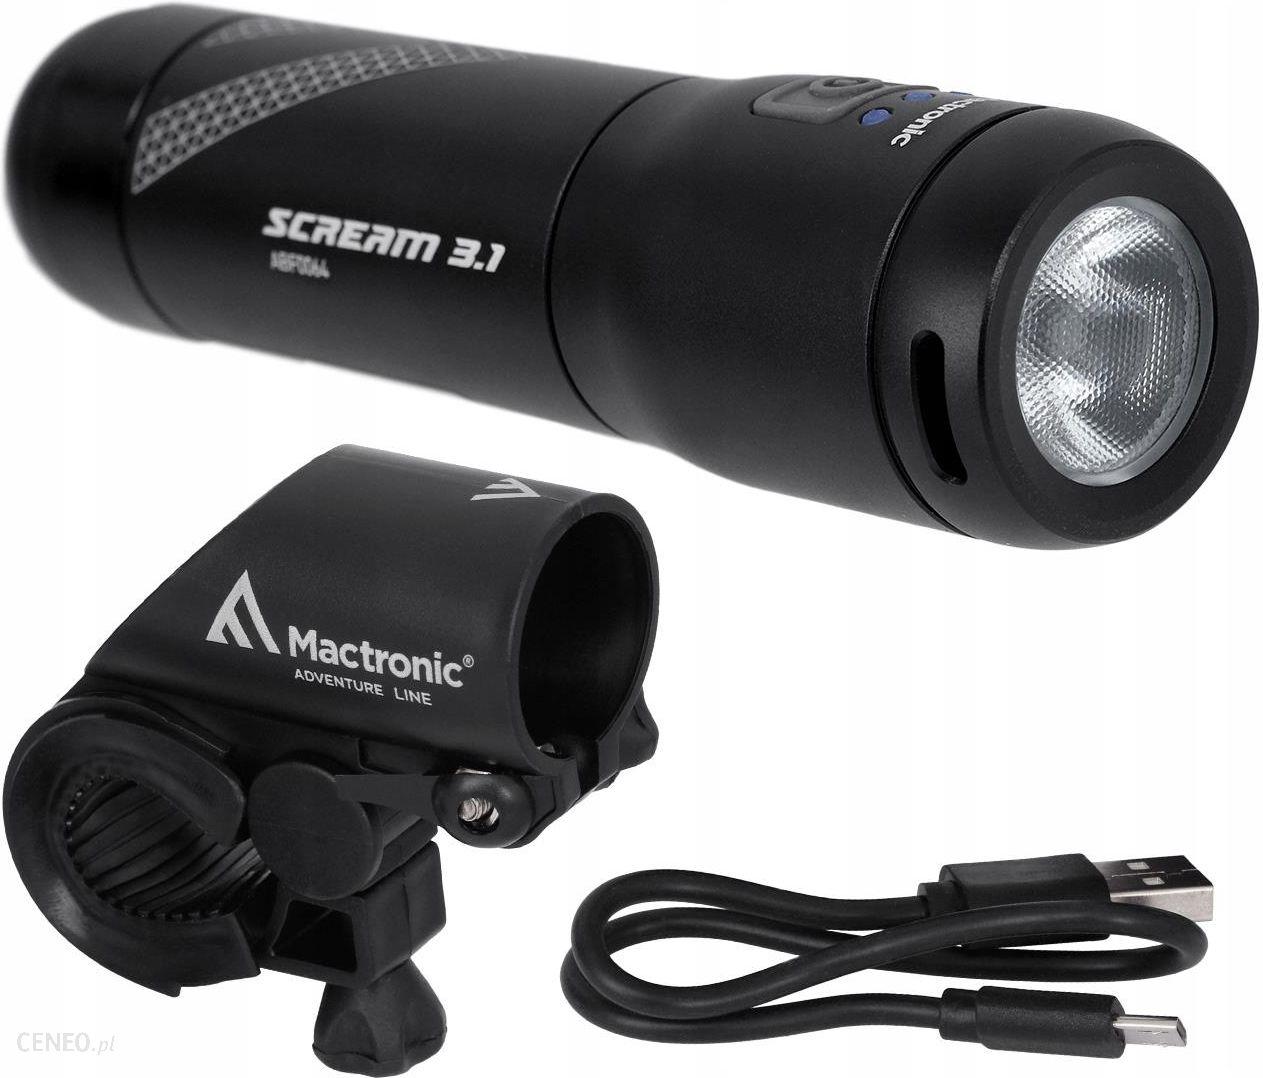 Mactronic Scream 3.1 Lampa Rowerowa Przednia 900 Lm Abf0064